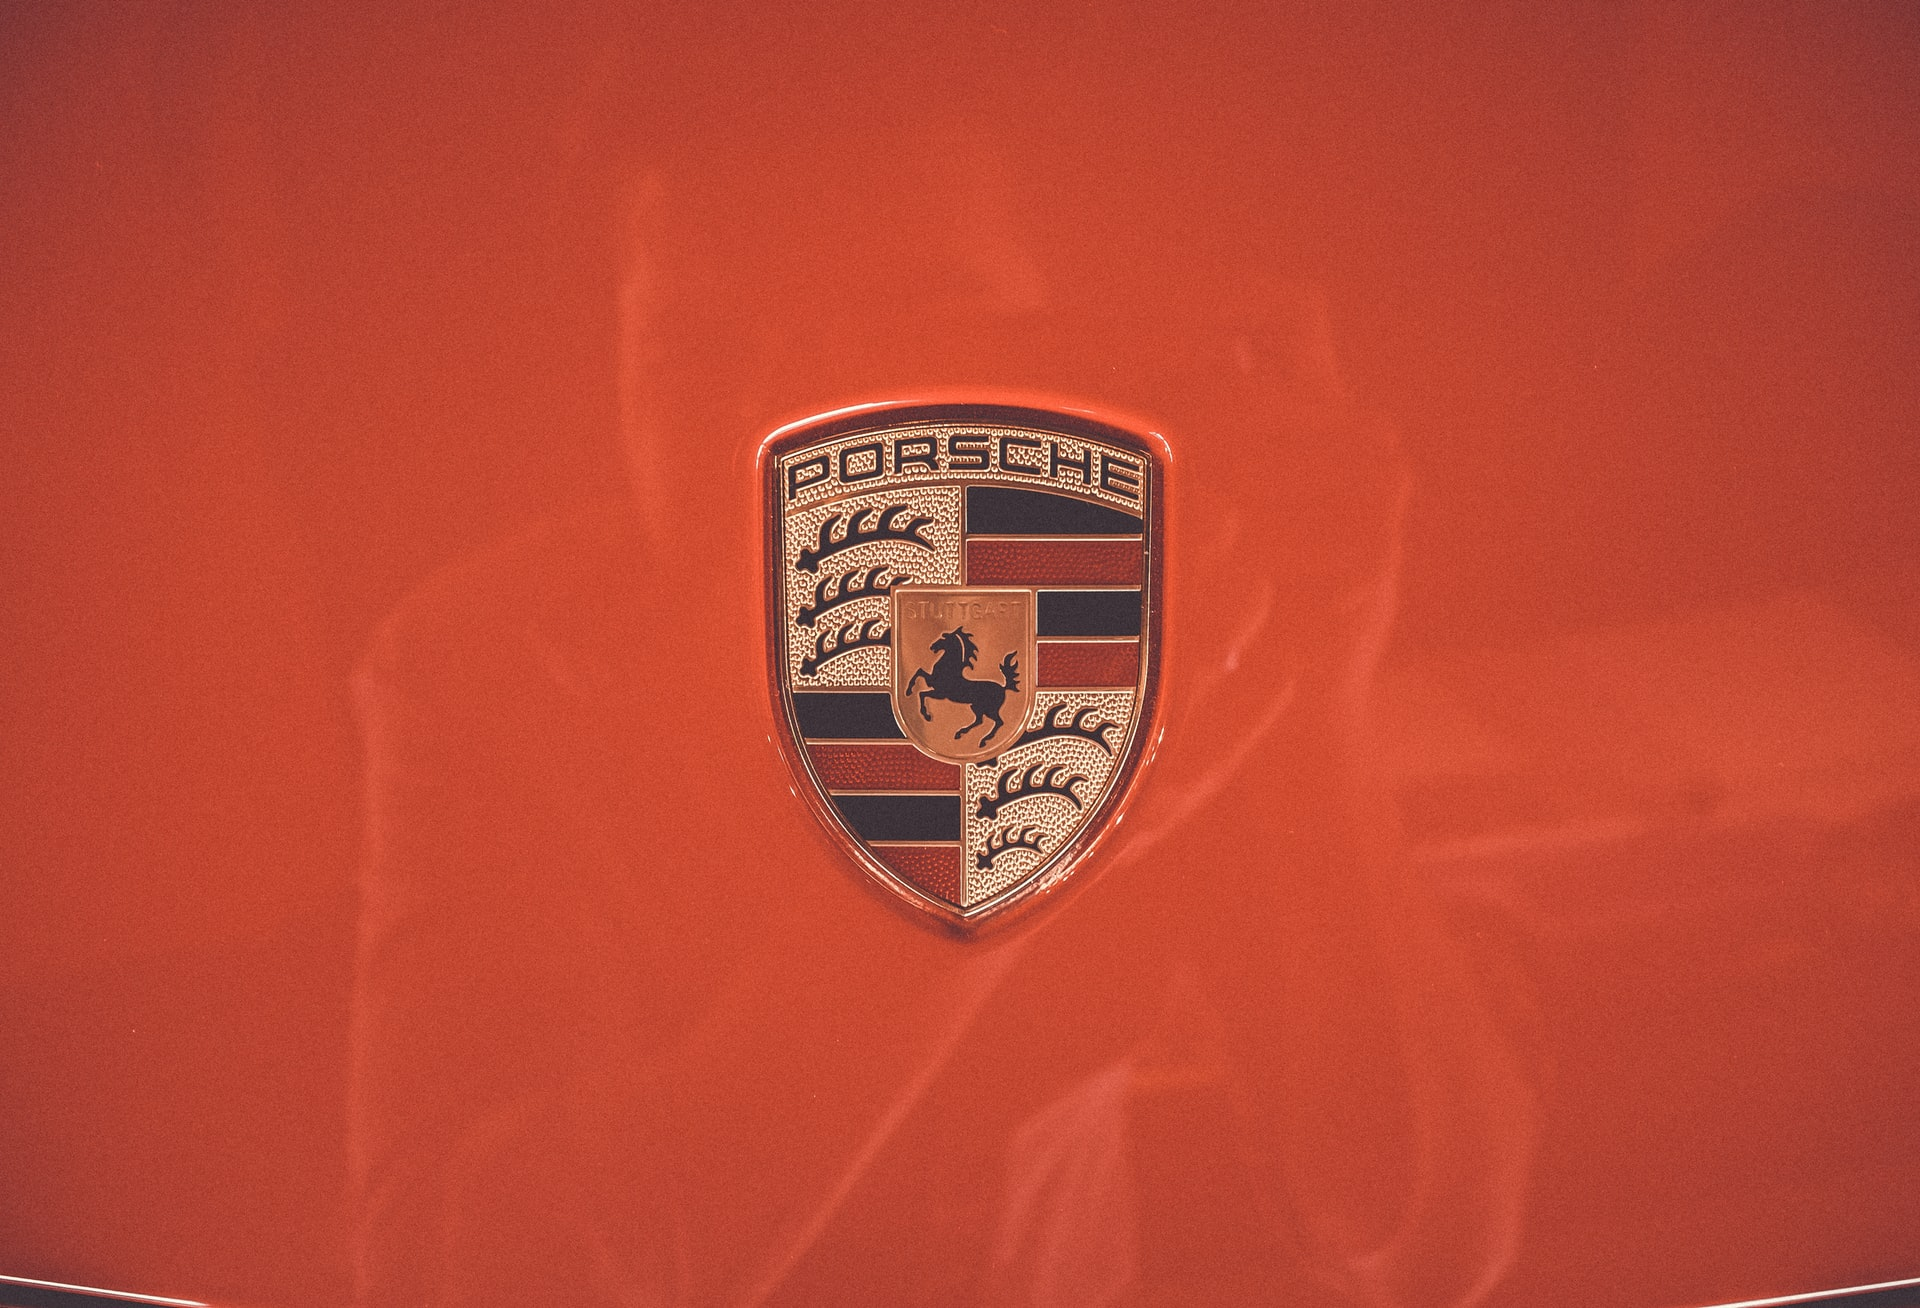 Porsche 911 Variants That You Can Buy New Today So Go Go Go!